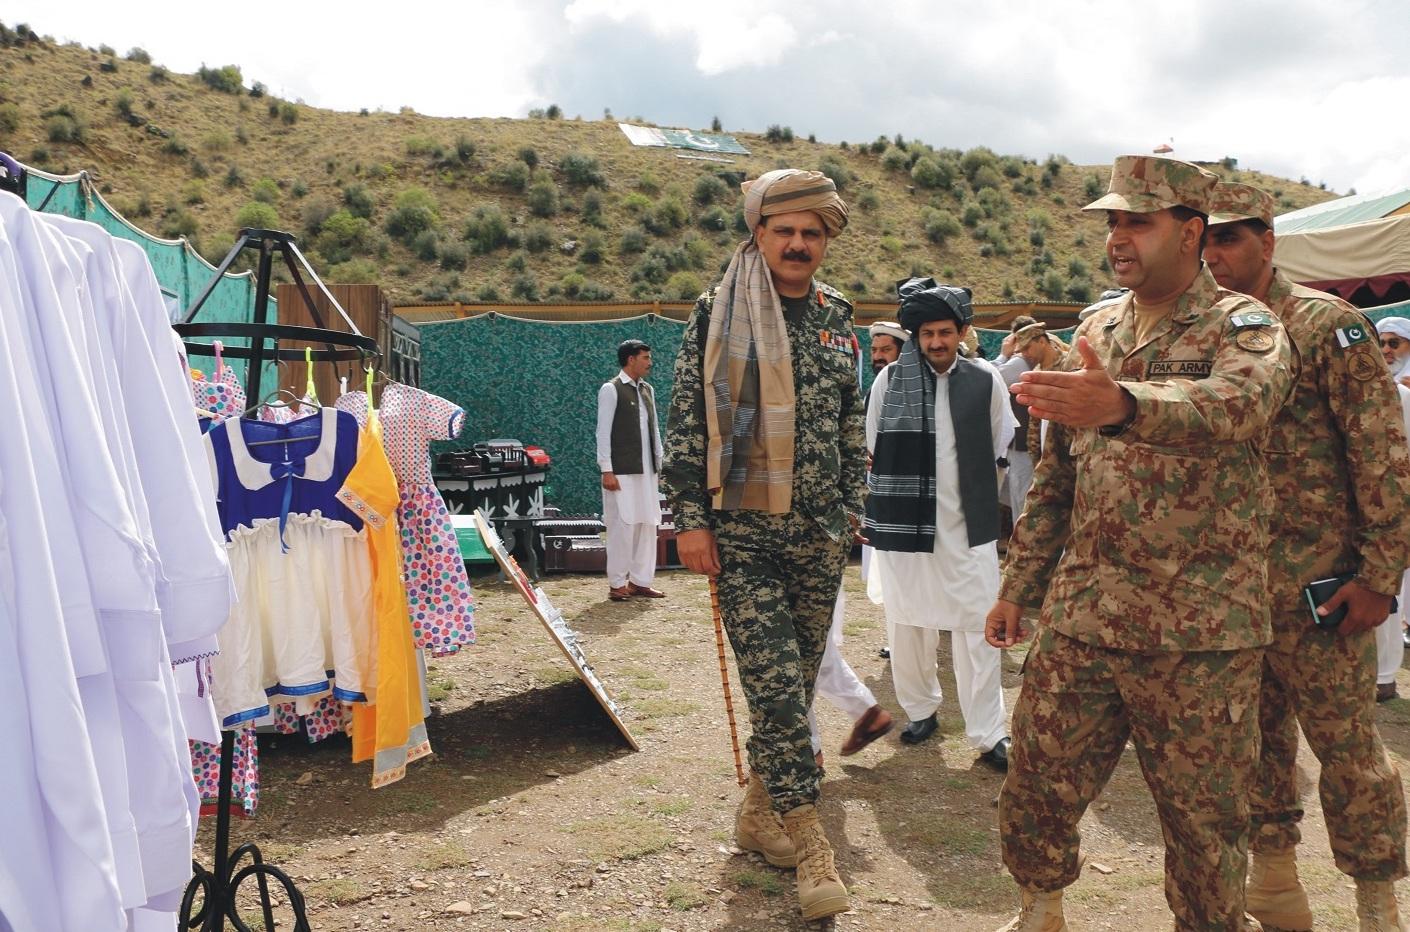 De-radicalised Pakistani youth become 'useful' members of society